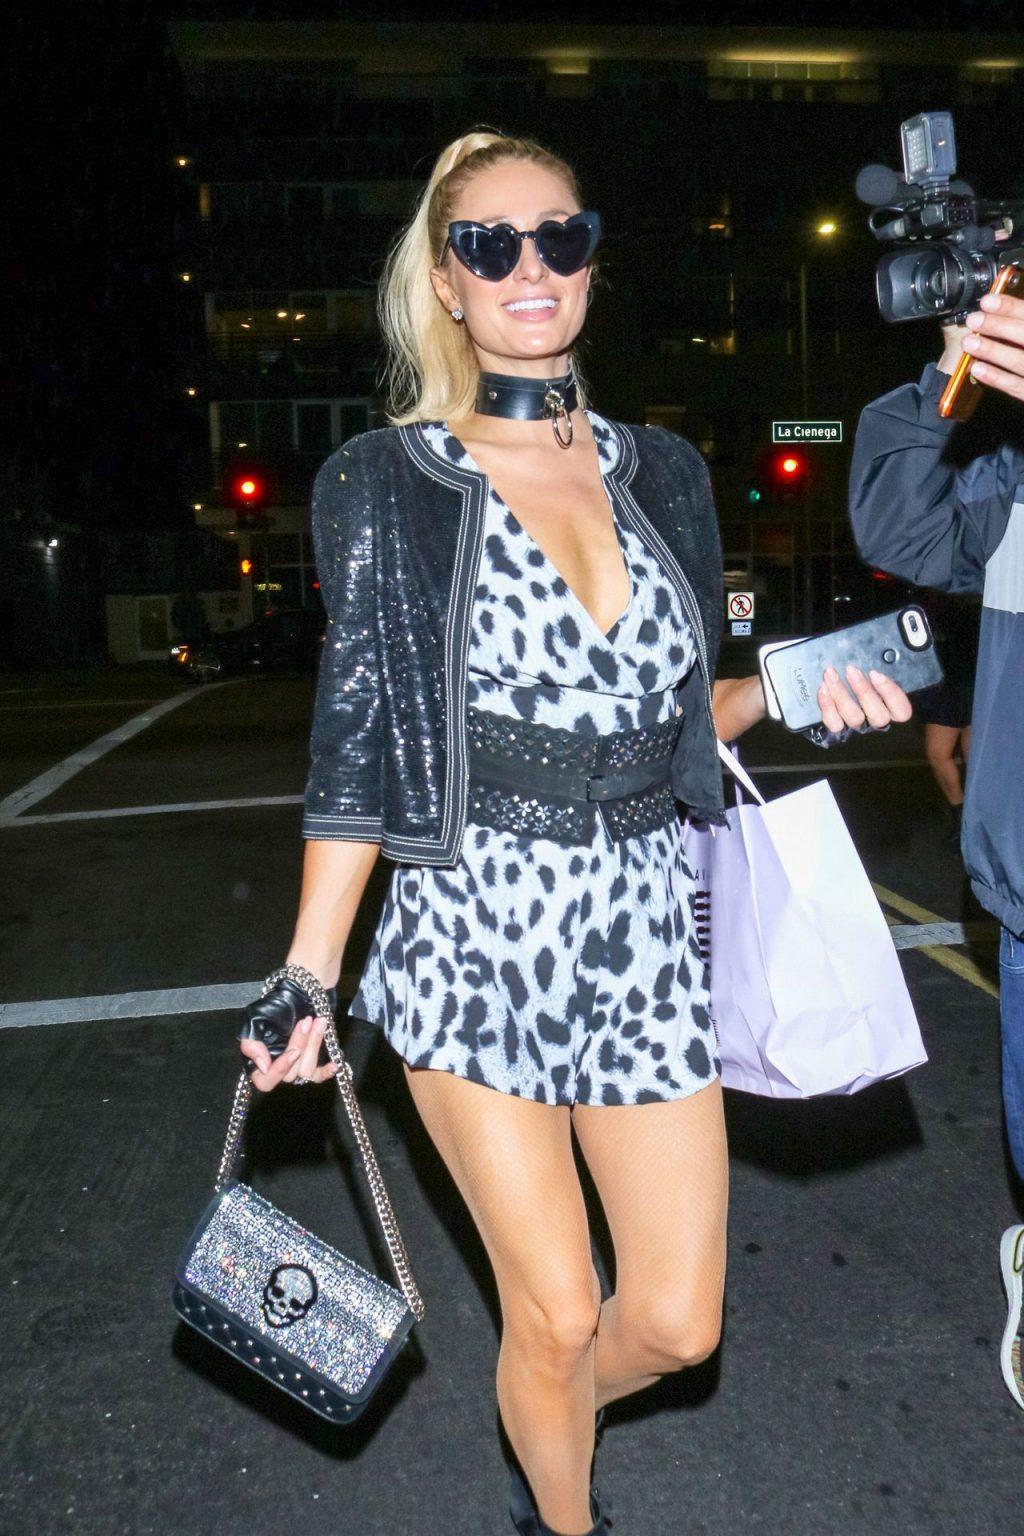 Paris Hilton Sexy Thefappeningblog Com 3 1024x1536